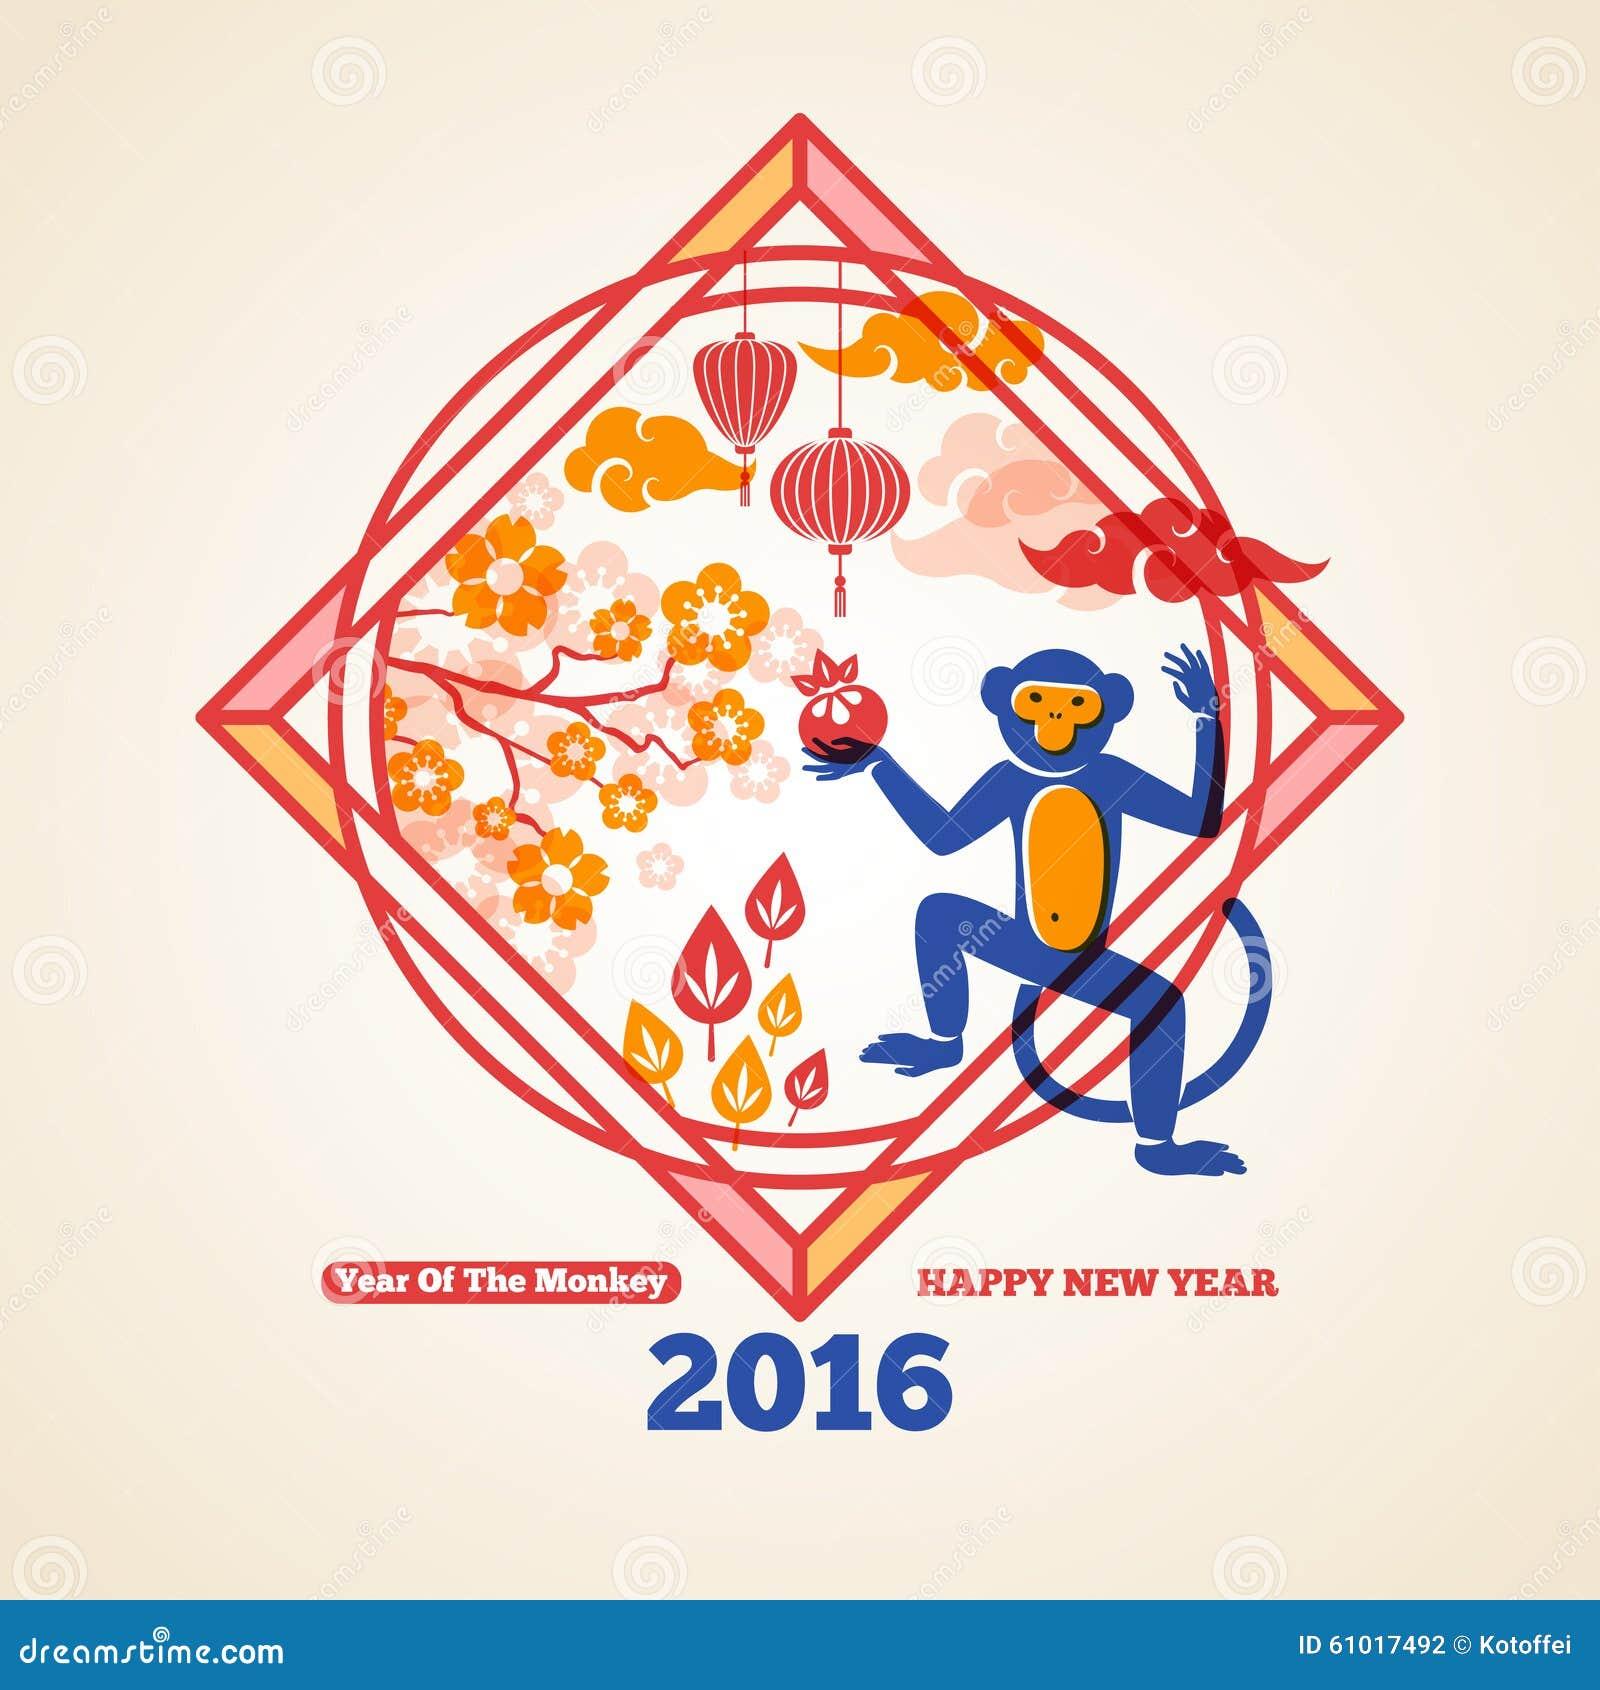 ... , Leaves, Cloud, Chinese Lanterns. Zodiac Symbol. Monkey Silhouette